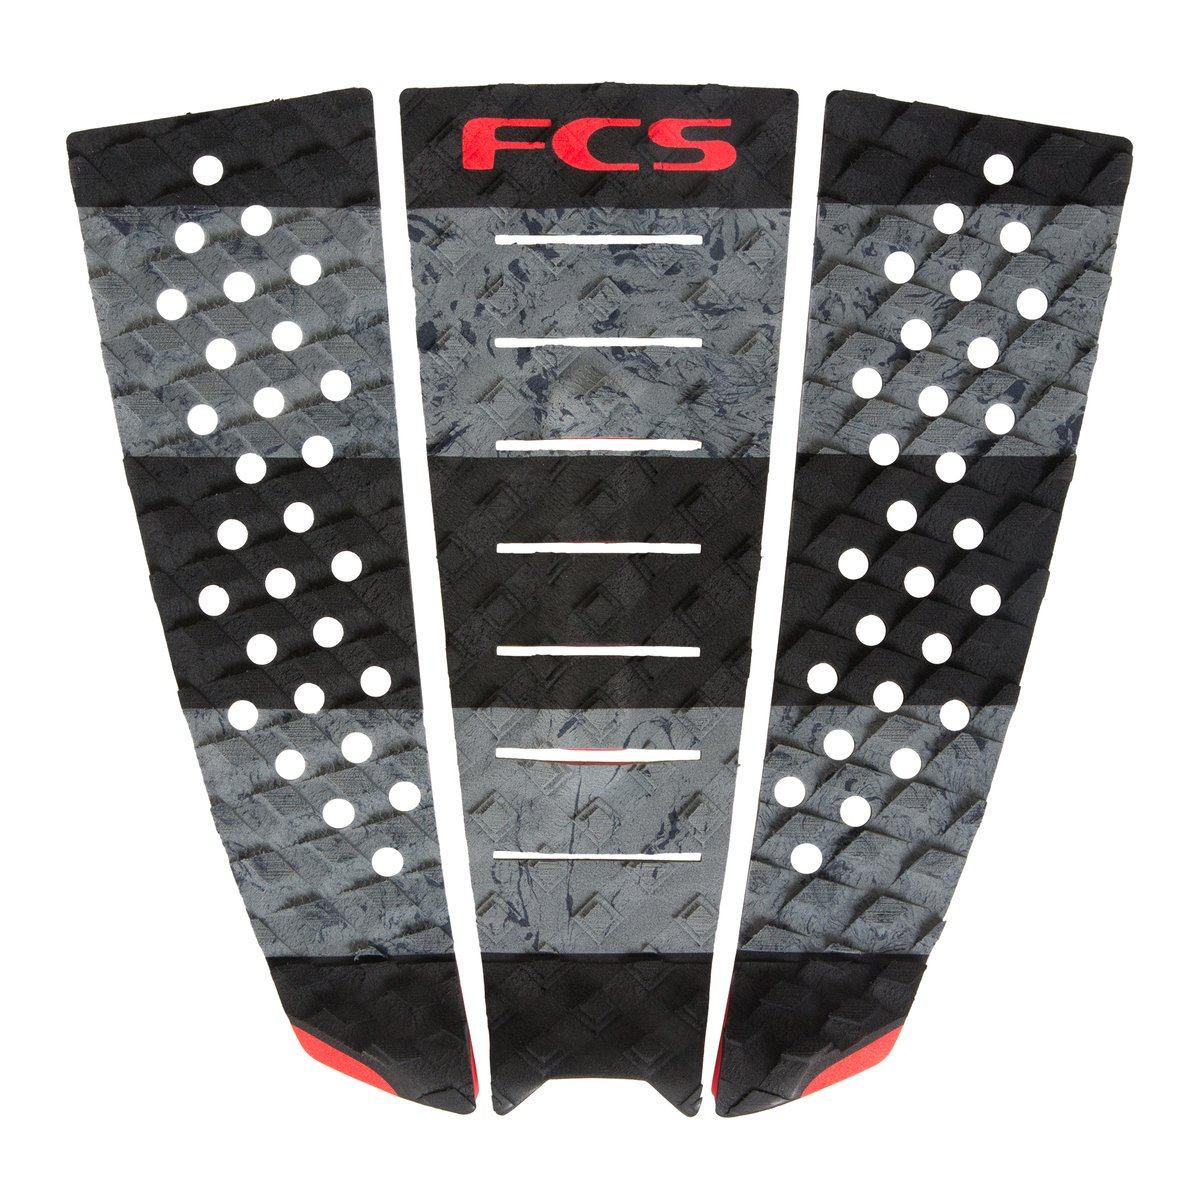 Deck FCS Jeremy Flores Stealth